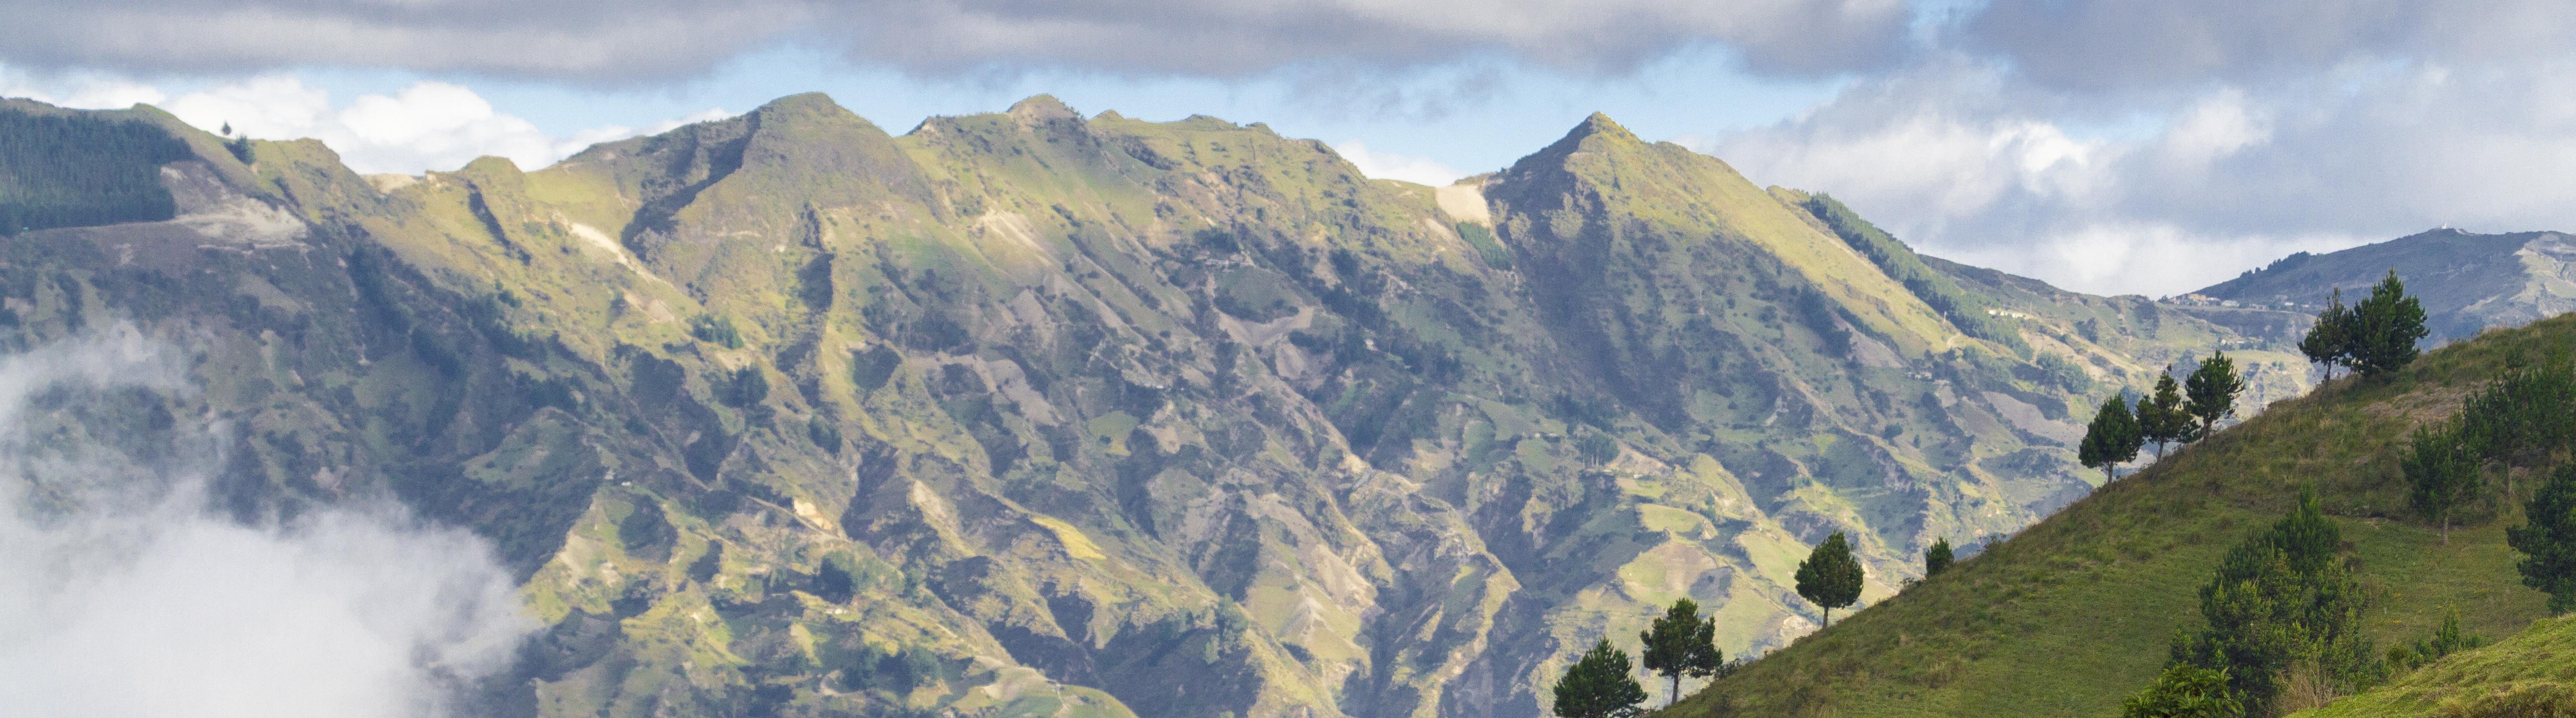 Chugchilan mountains10mb